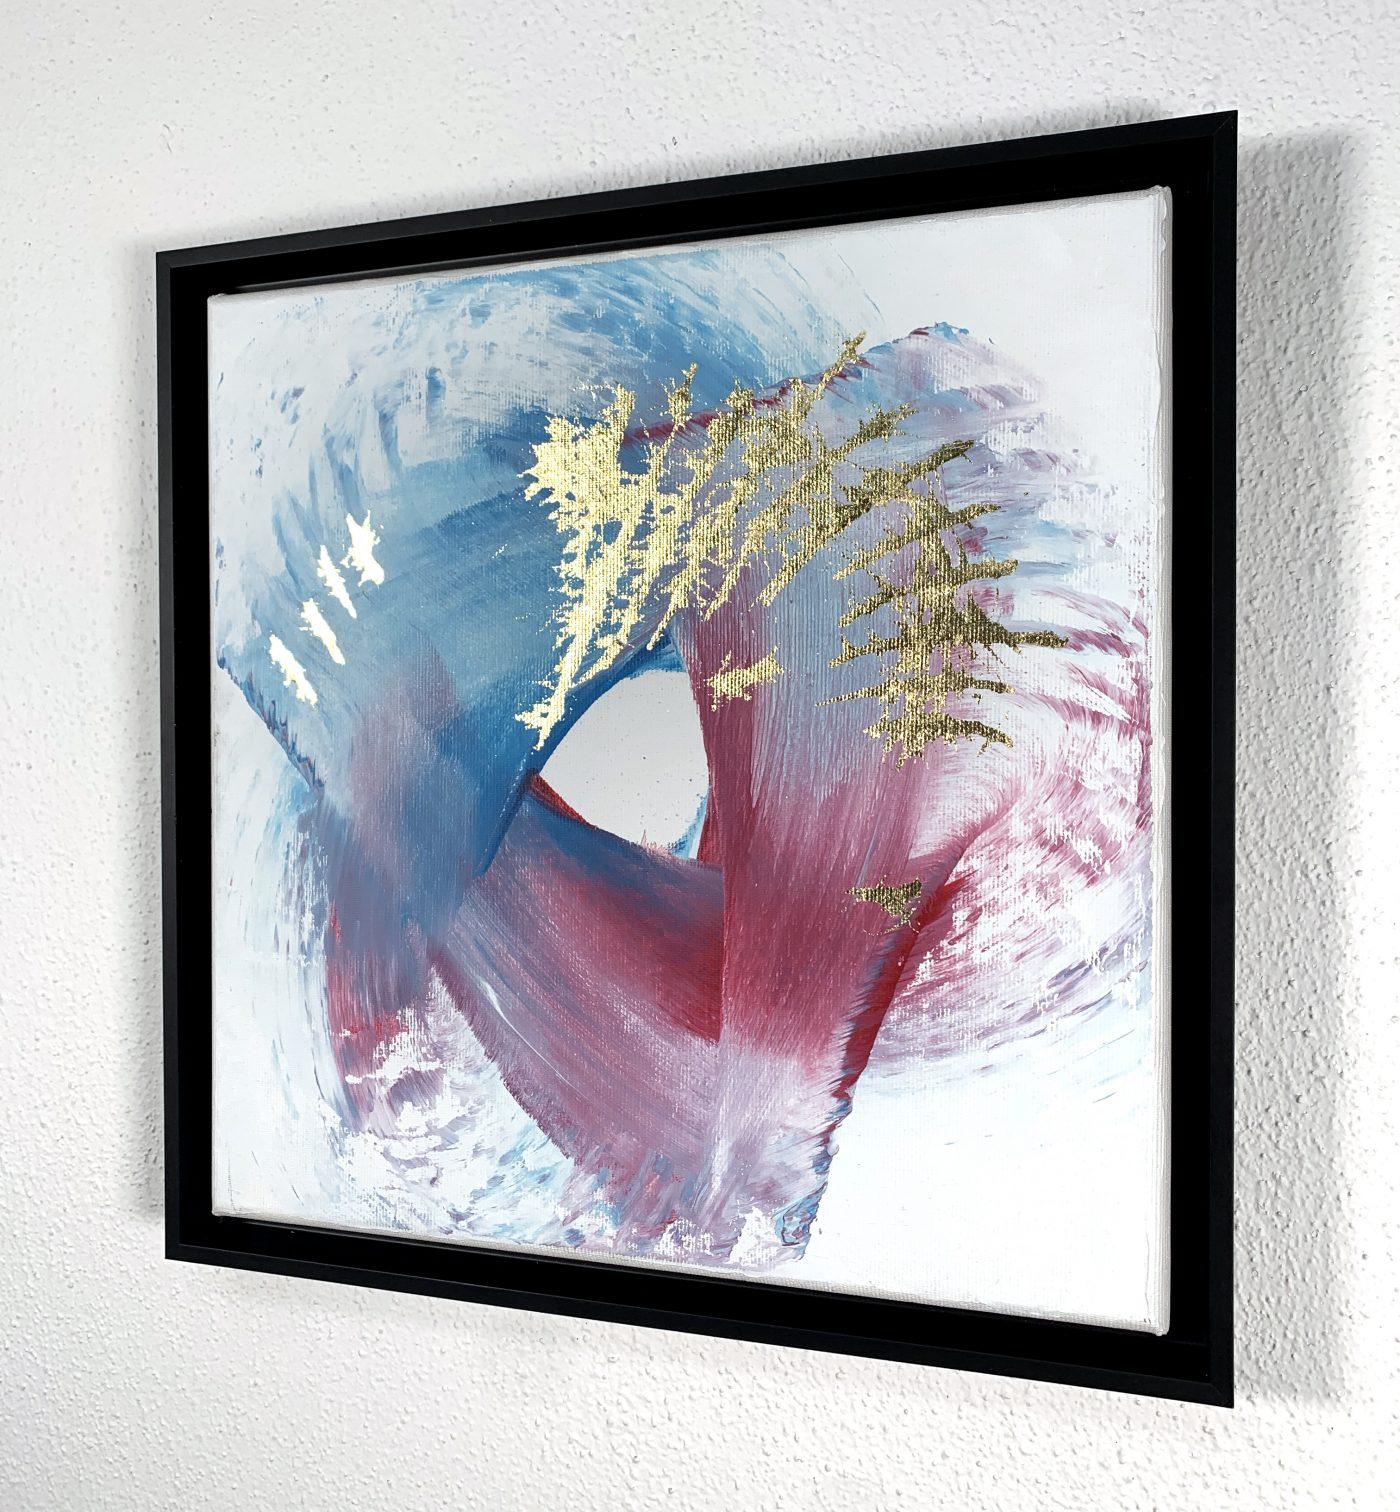 x383 - 17 Jan 2021 - Canvas